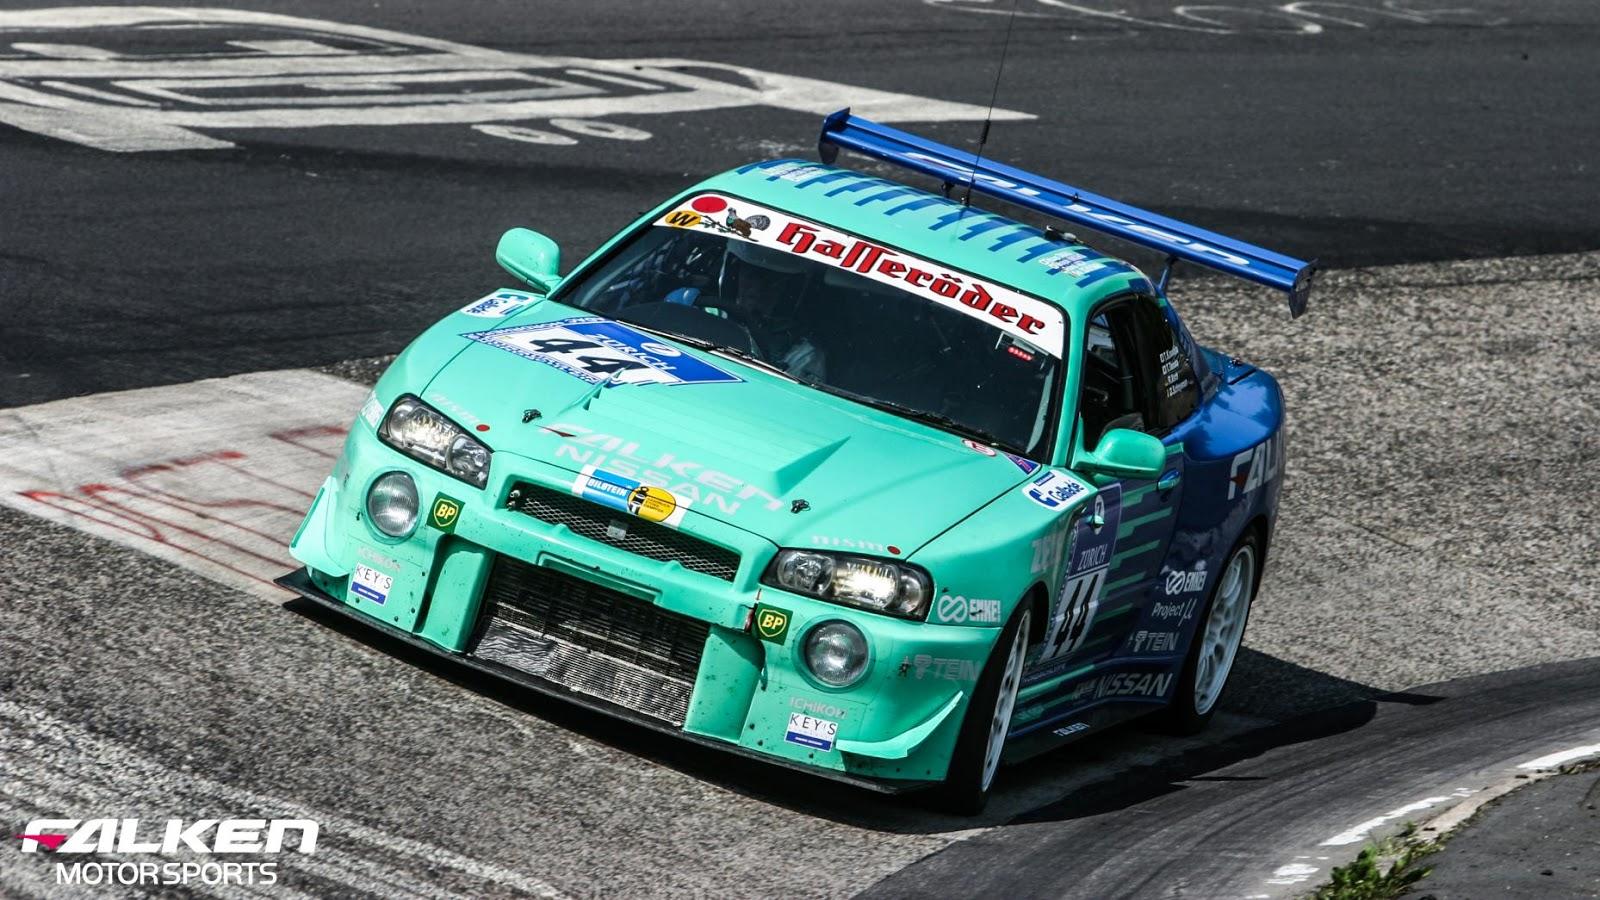 2003 - Nissan Skyline GT-R R34